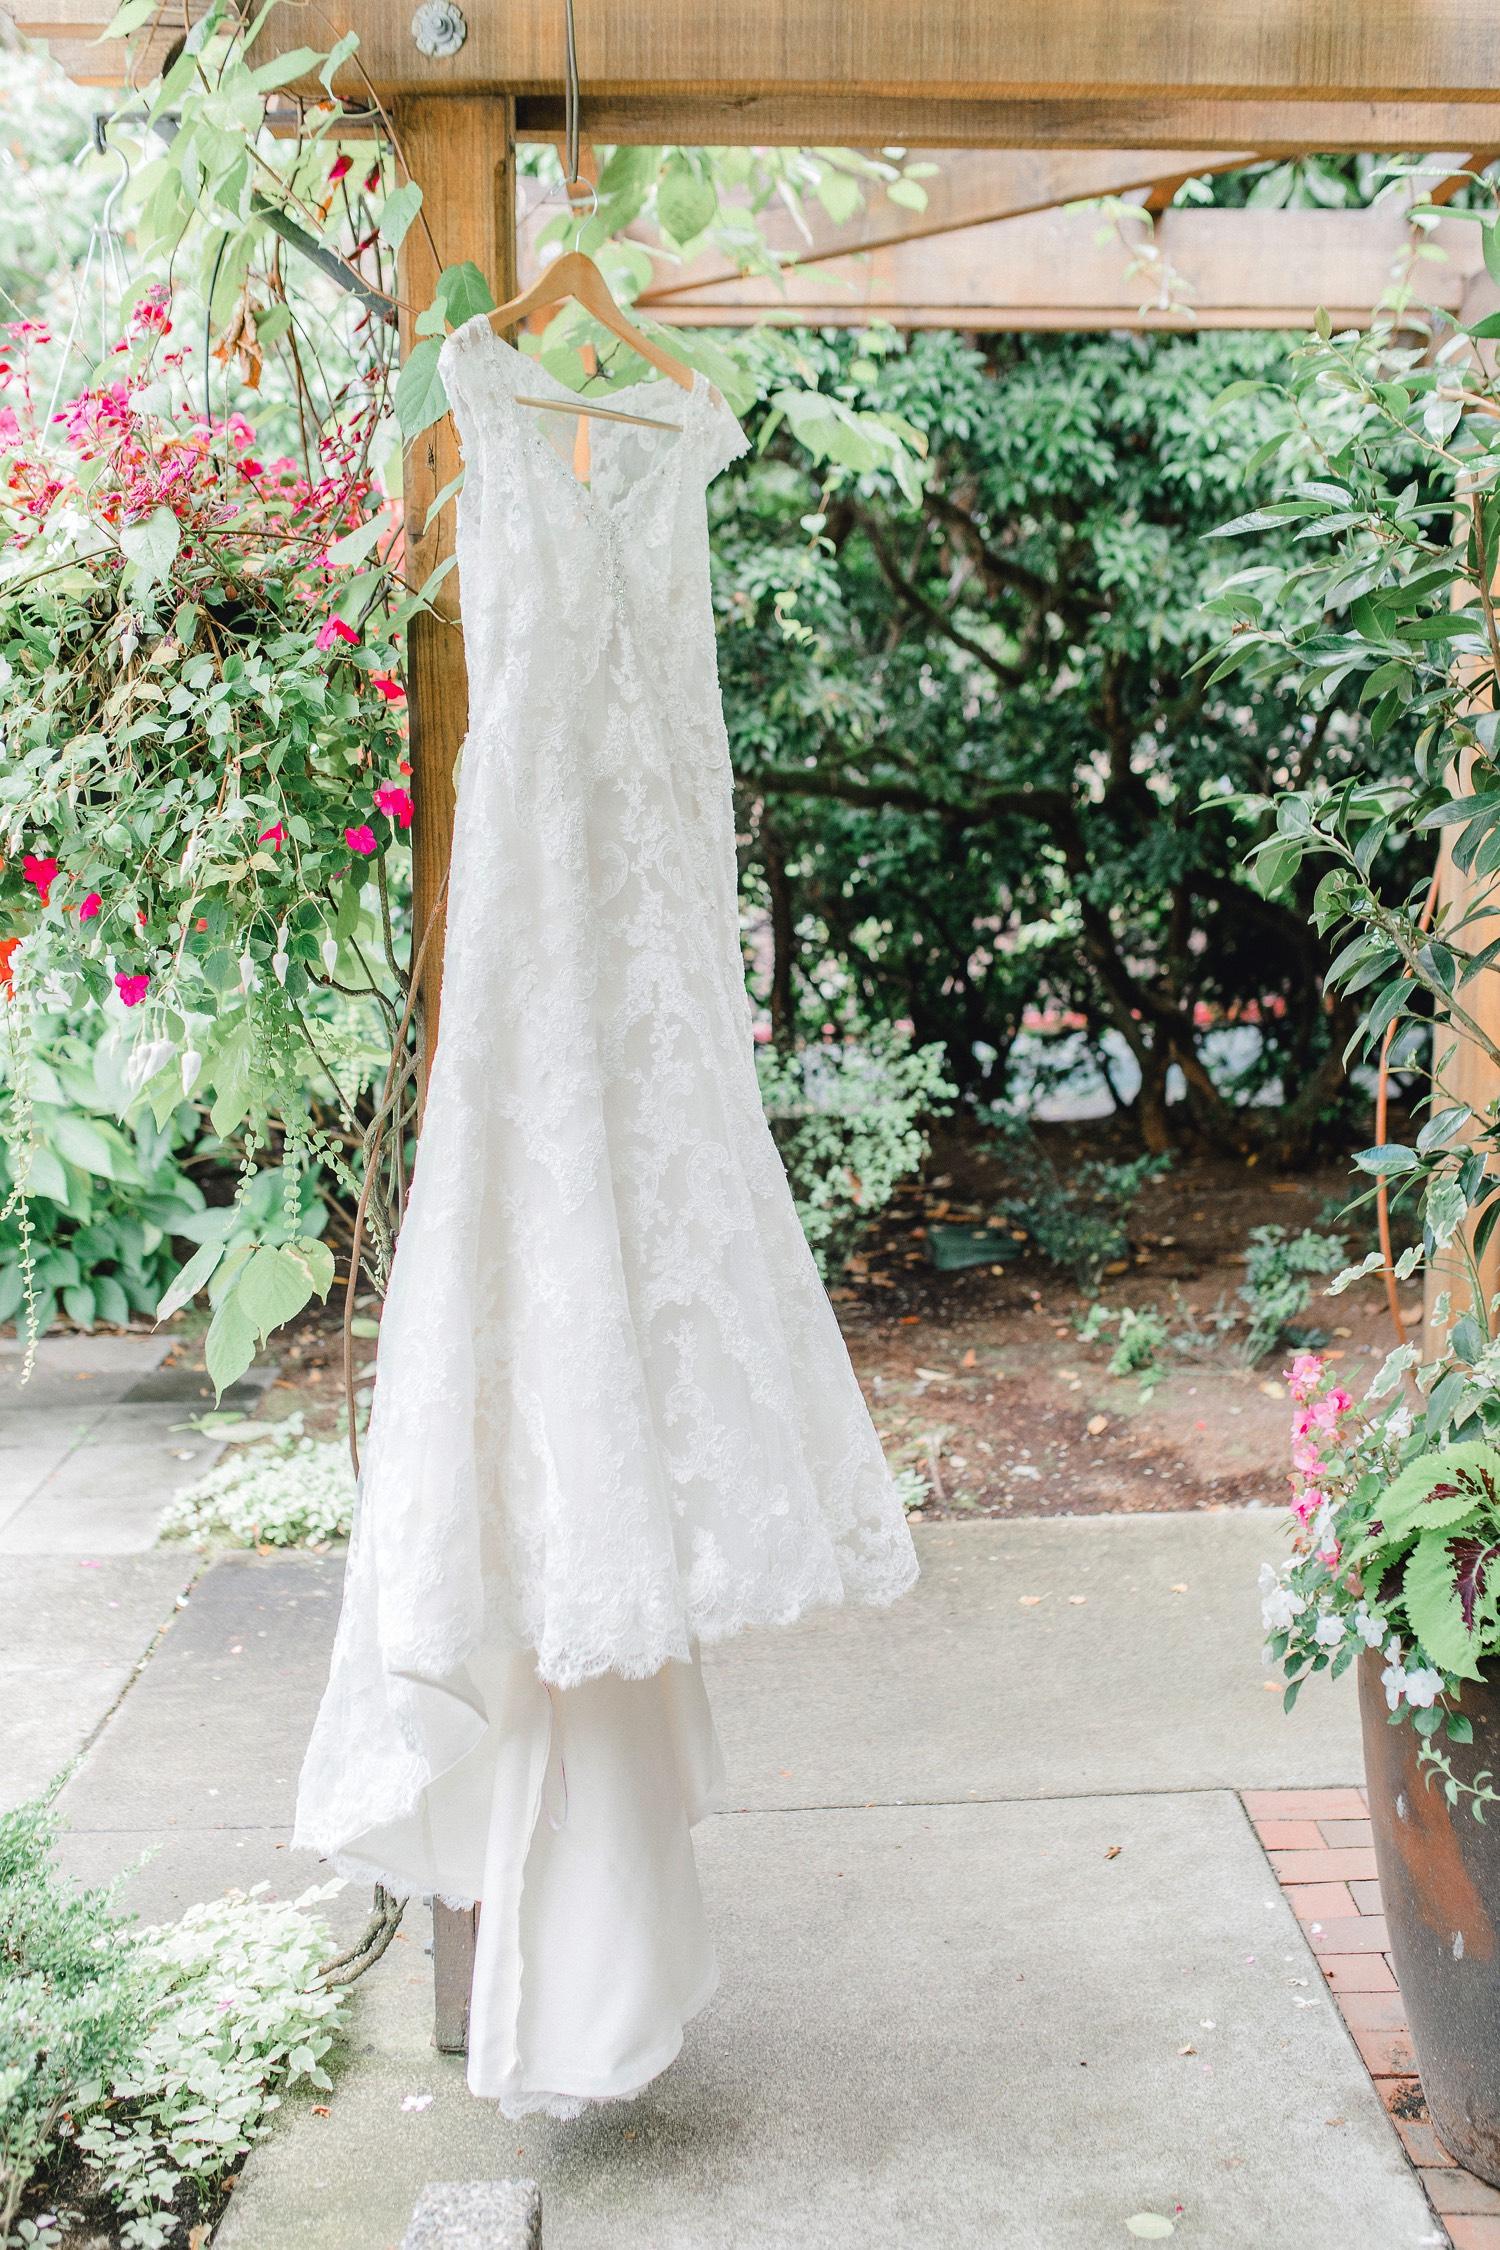 0000000000005_emmarosecompany_katiematt-2754_Photographer_PNW_House_Robinswood_Emma_Light_Company_Airy_Rose_and_Wedding_Seattle.jpg